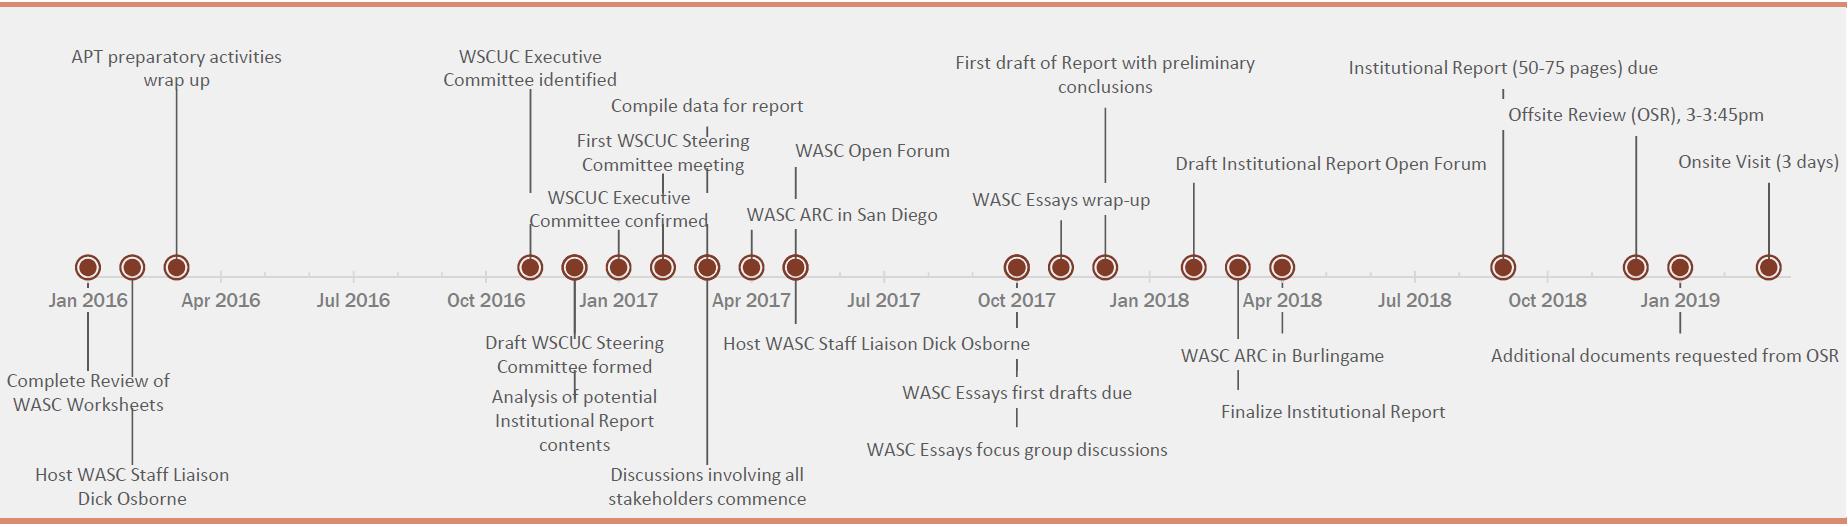 WASC Accreditation Process - WASC Accreditation - CSU, Chico